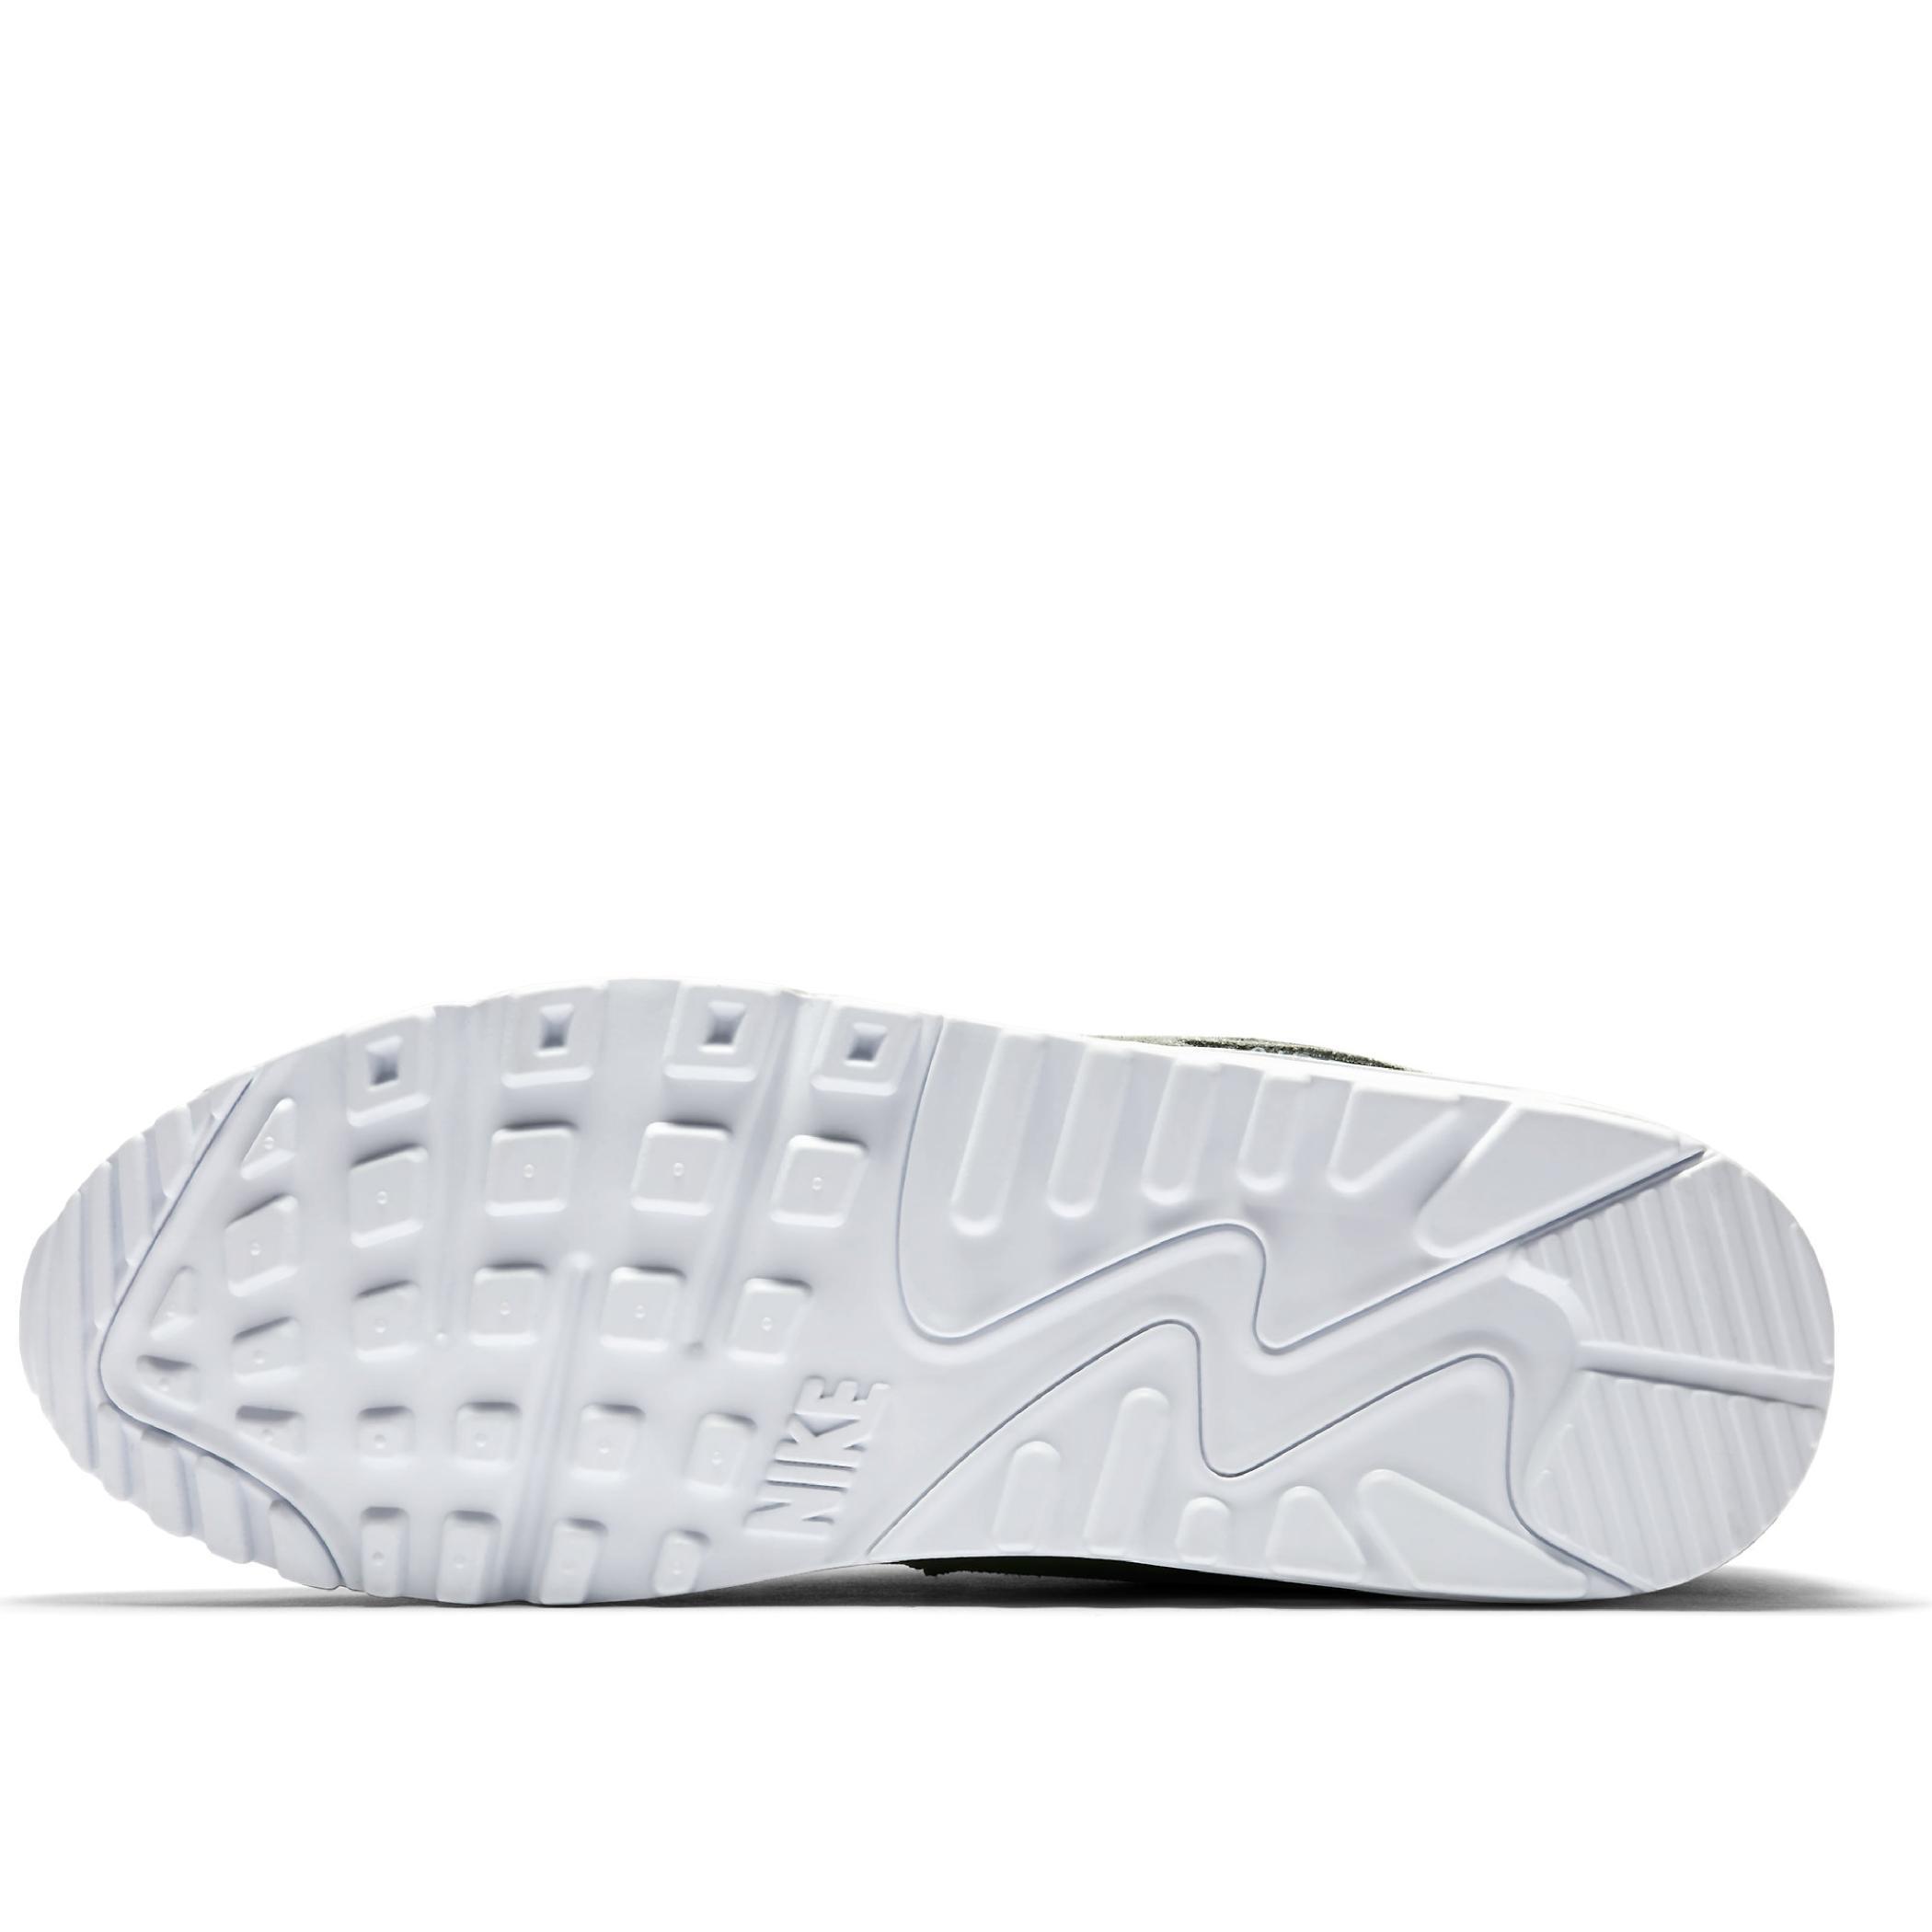 uk availability 358e9 b77d0 Кеды Air Max 90 от Nike (AJ1285-300) - продажа, цена, фото ...